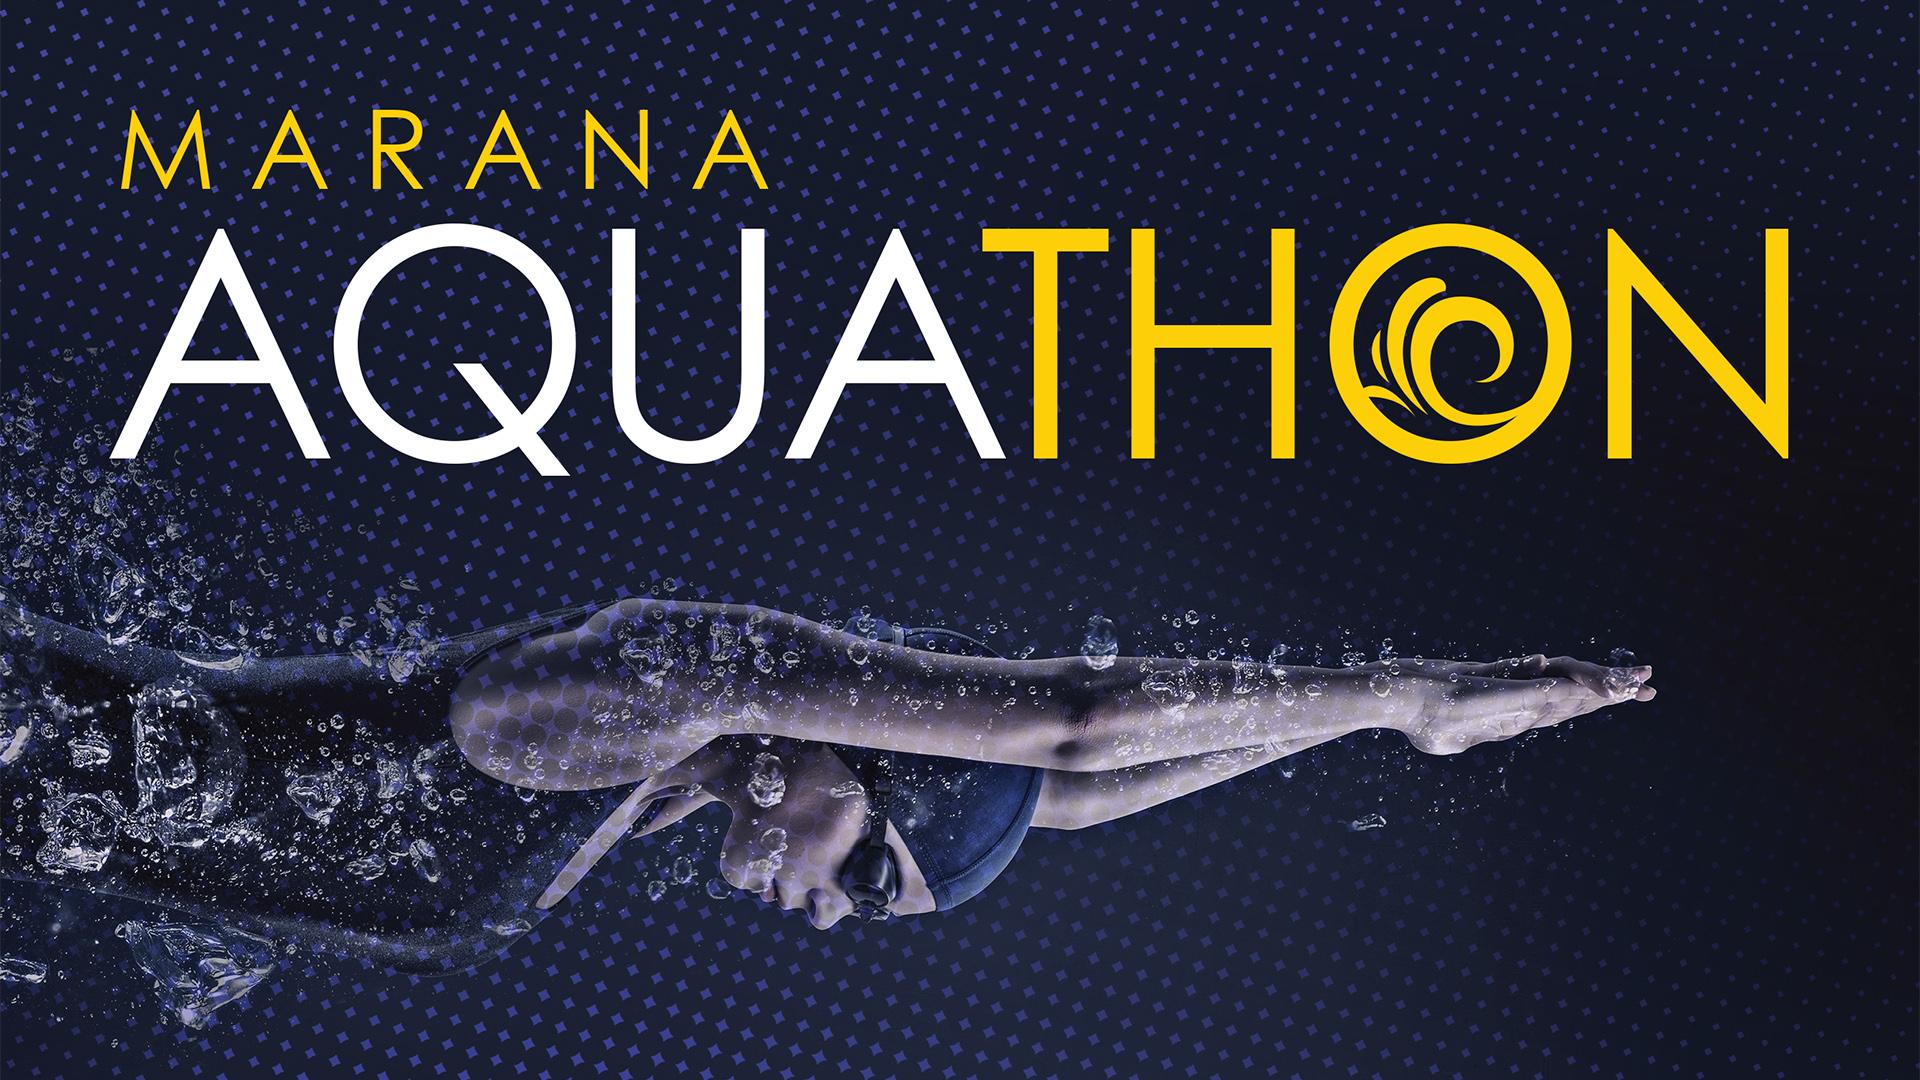 Aquathon_16x9.jpg